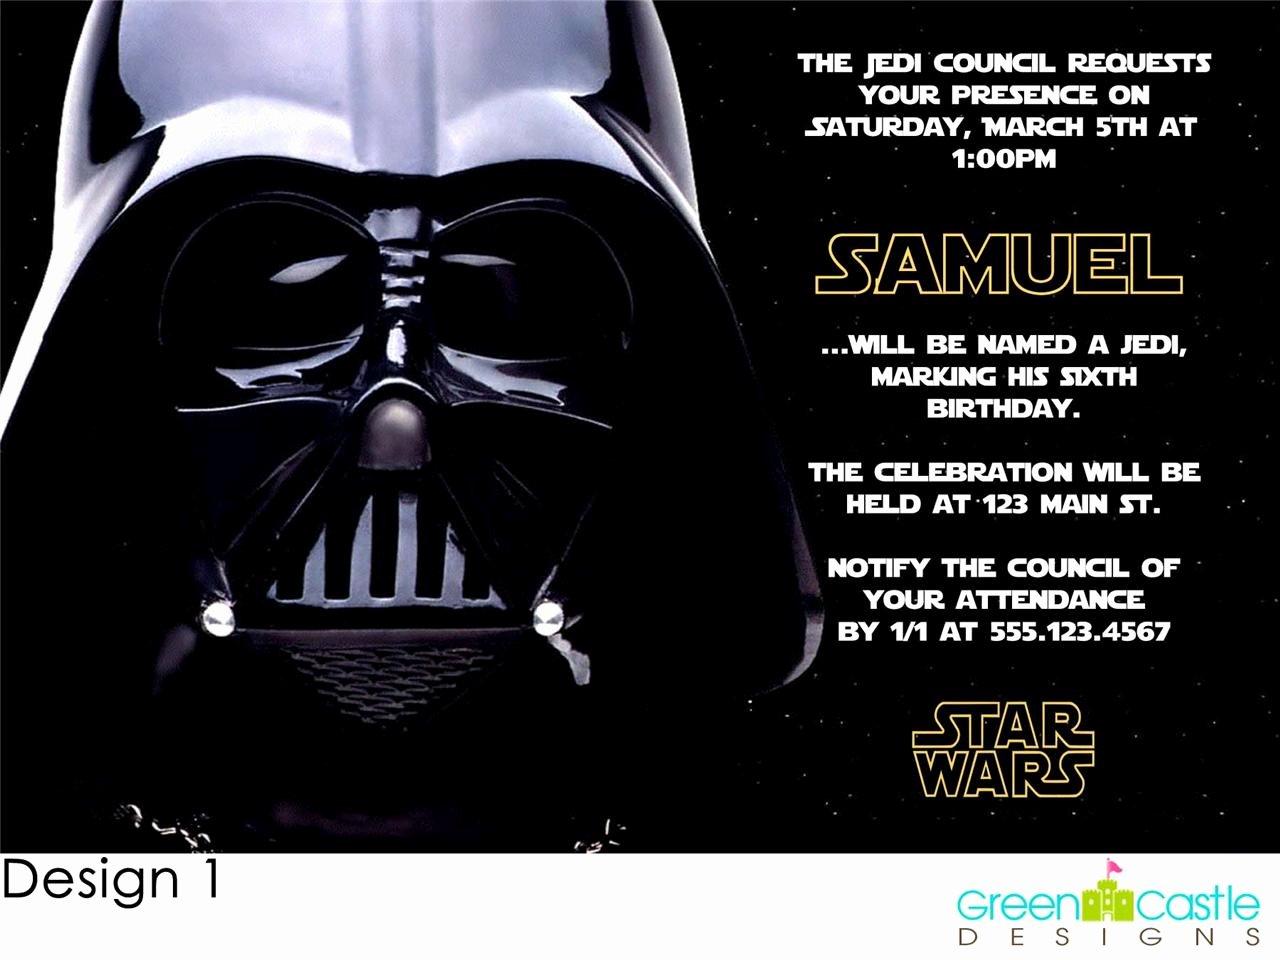 Stars Wars Birthday Invitations Awesome 20 Star Wars Invitations Darth Vader Custom Birthday Party Invites